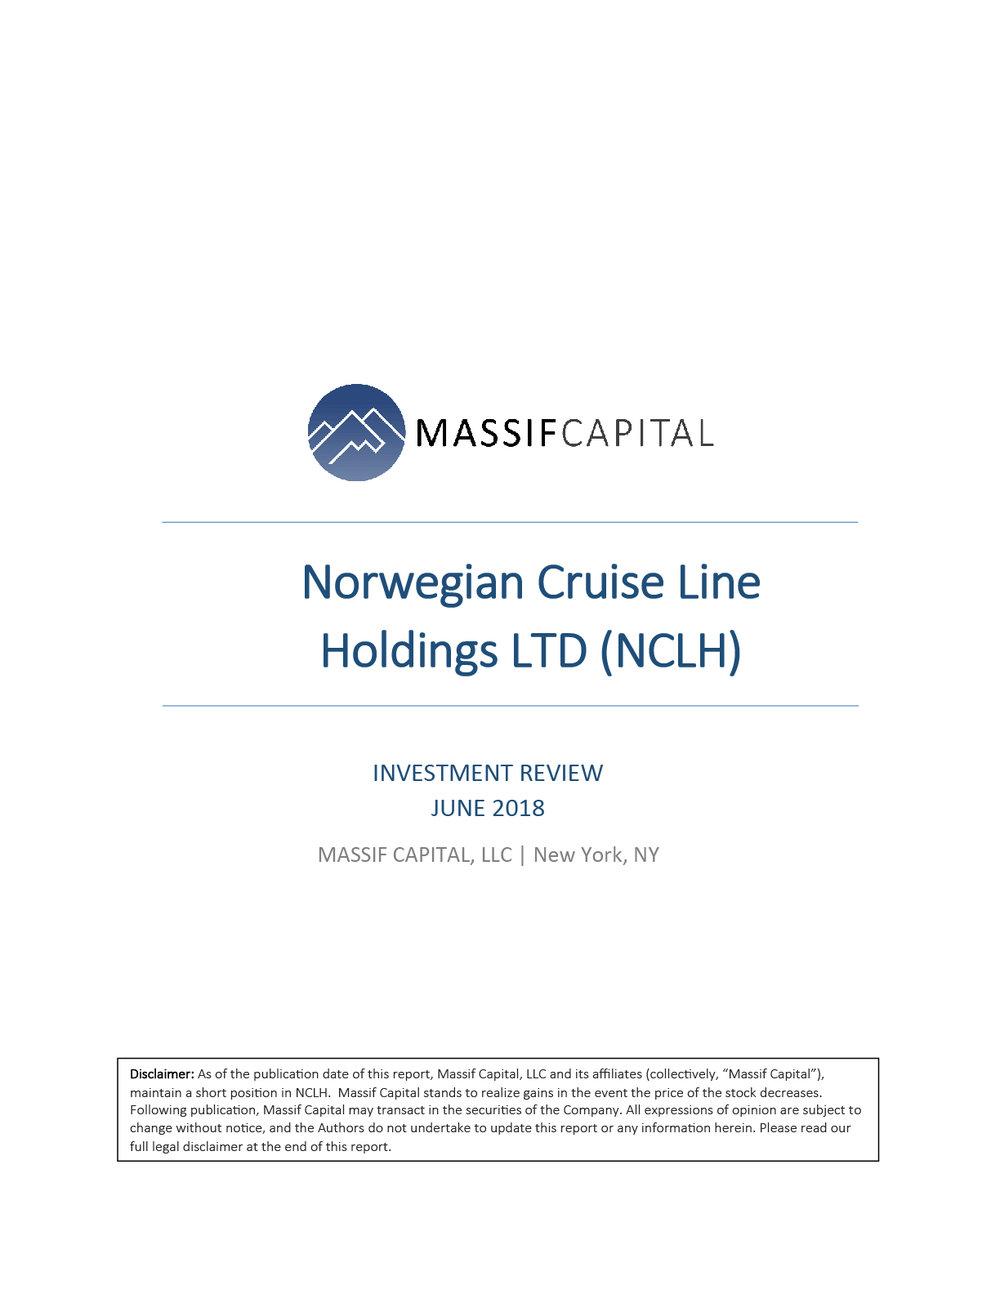 NCLH 1.jpg